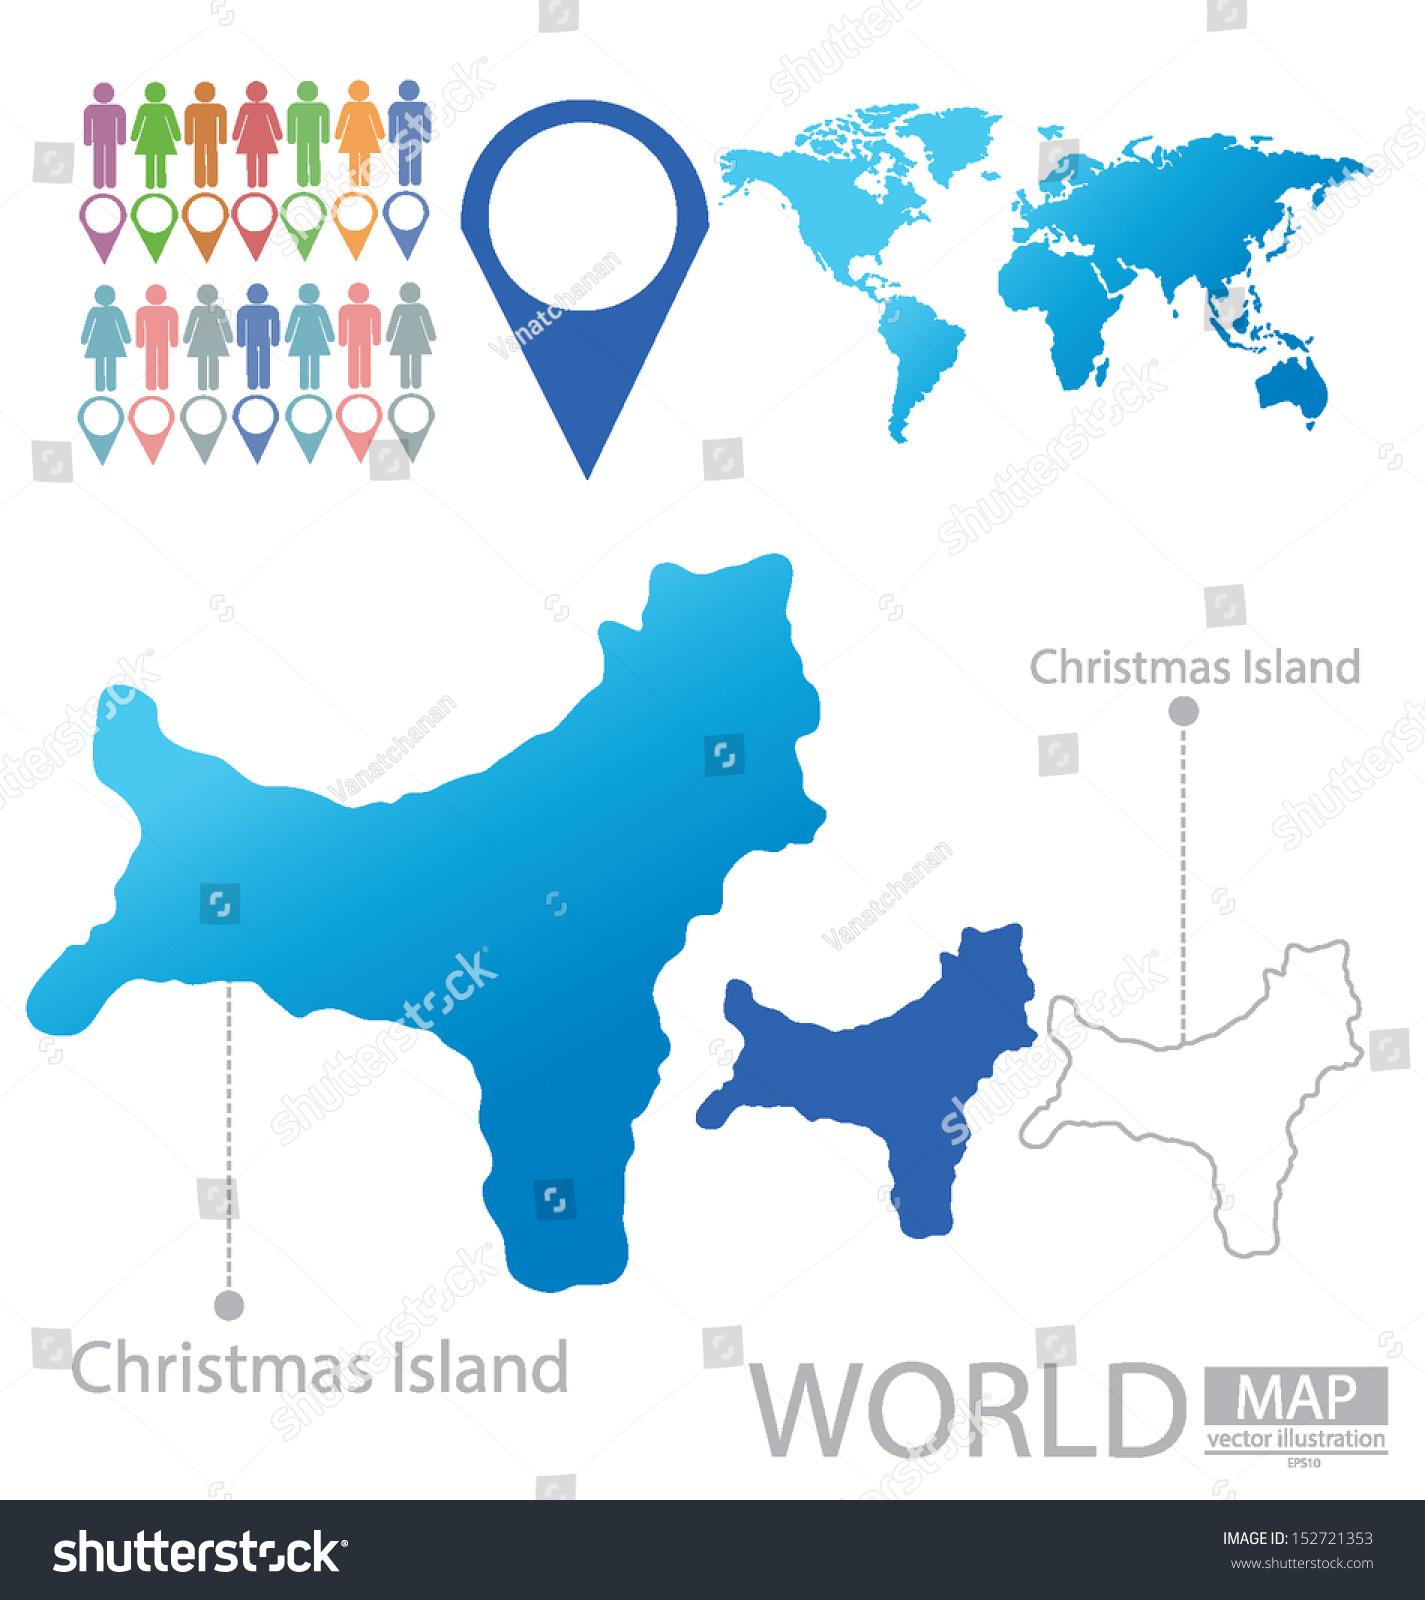 Christmas Island World Map Vector Illustration Stock Vector Royalty